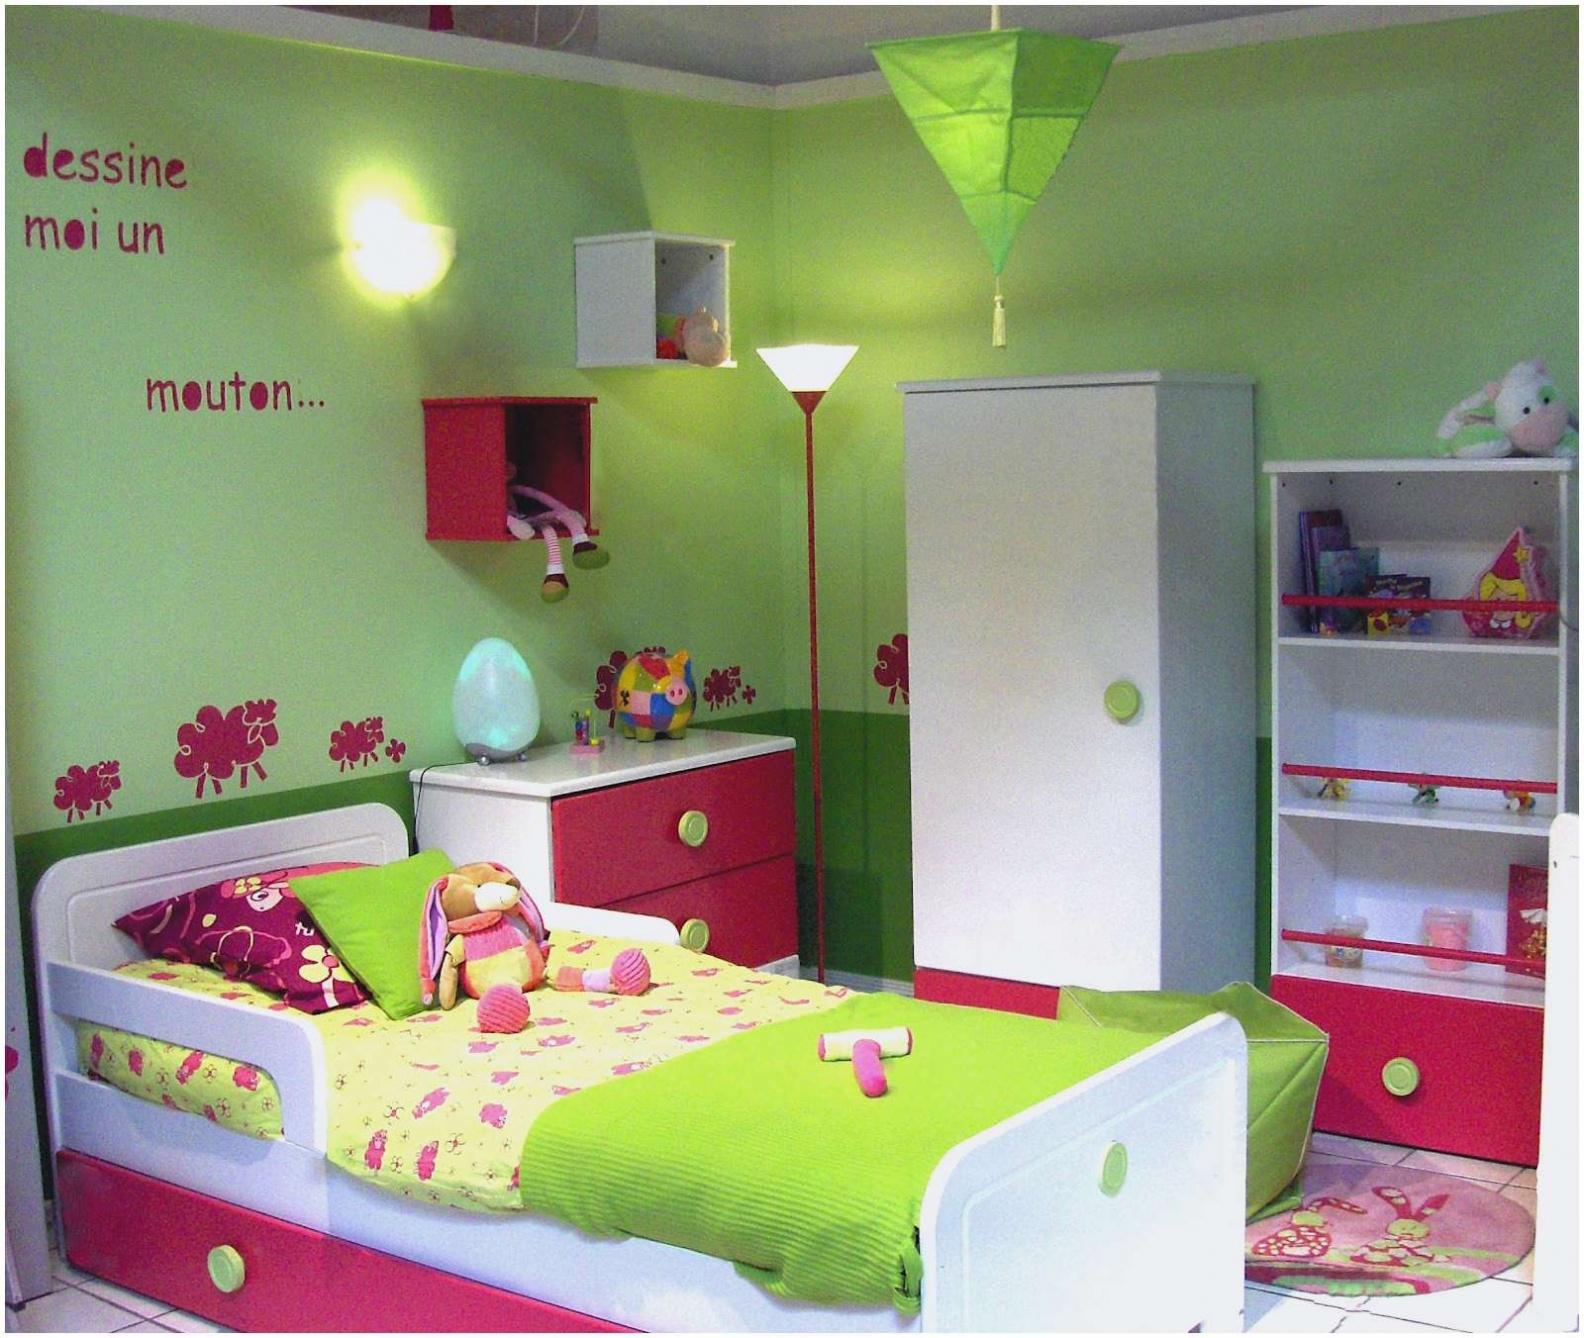 le meilleur de 20 beautiful idee chambre fille pour excellent idee idee chambre d ado fille of idee chambre d ado fille